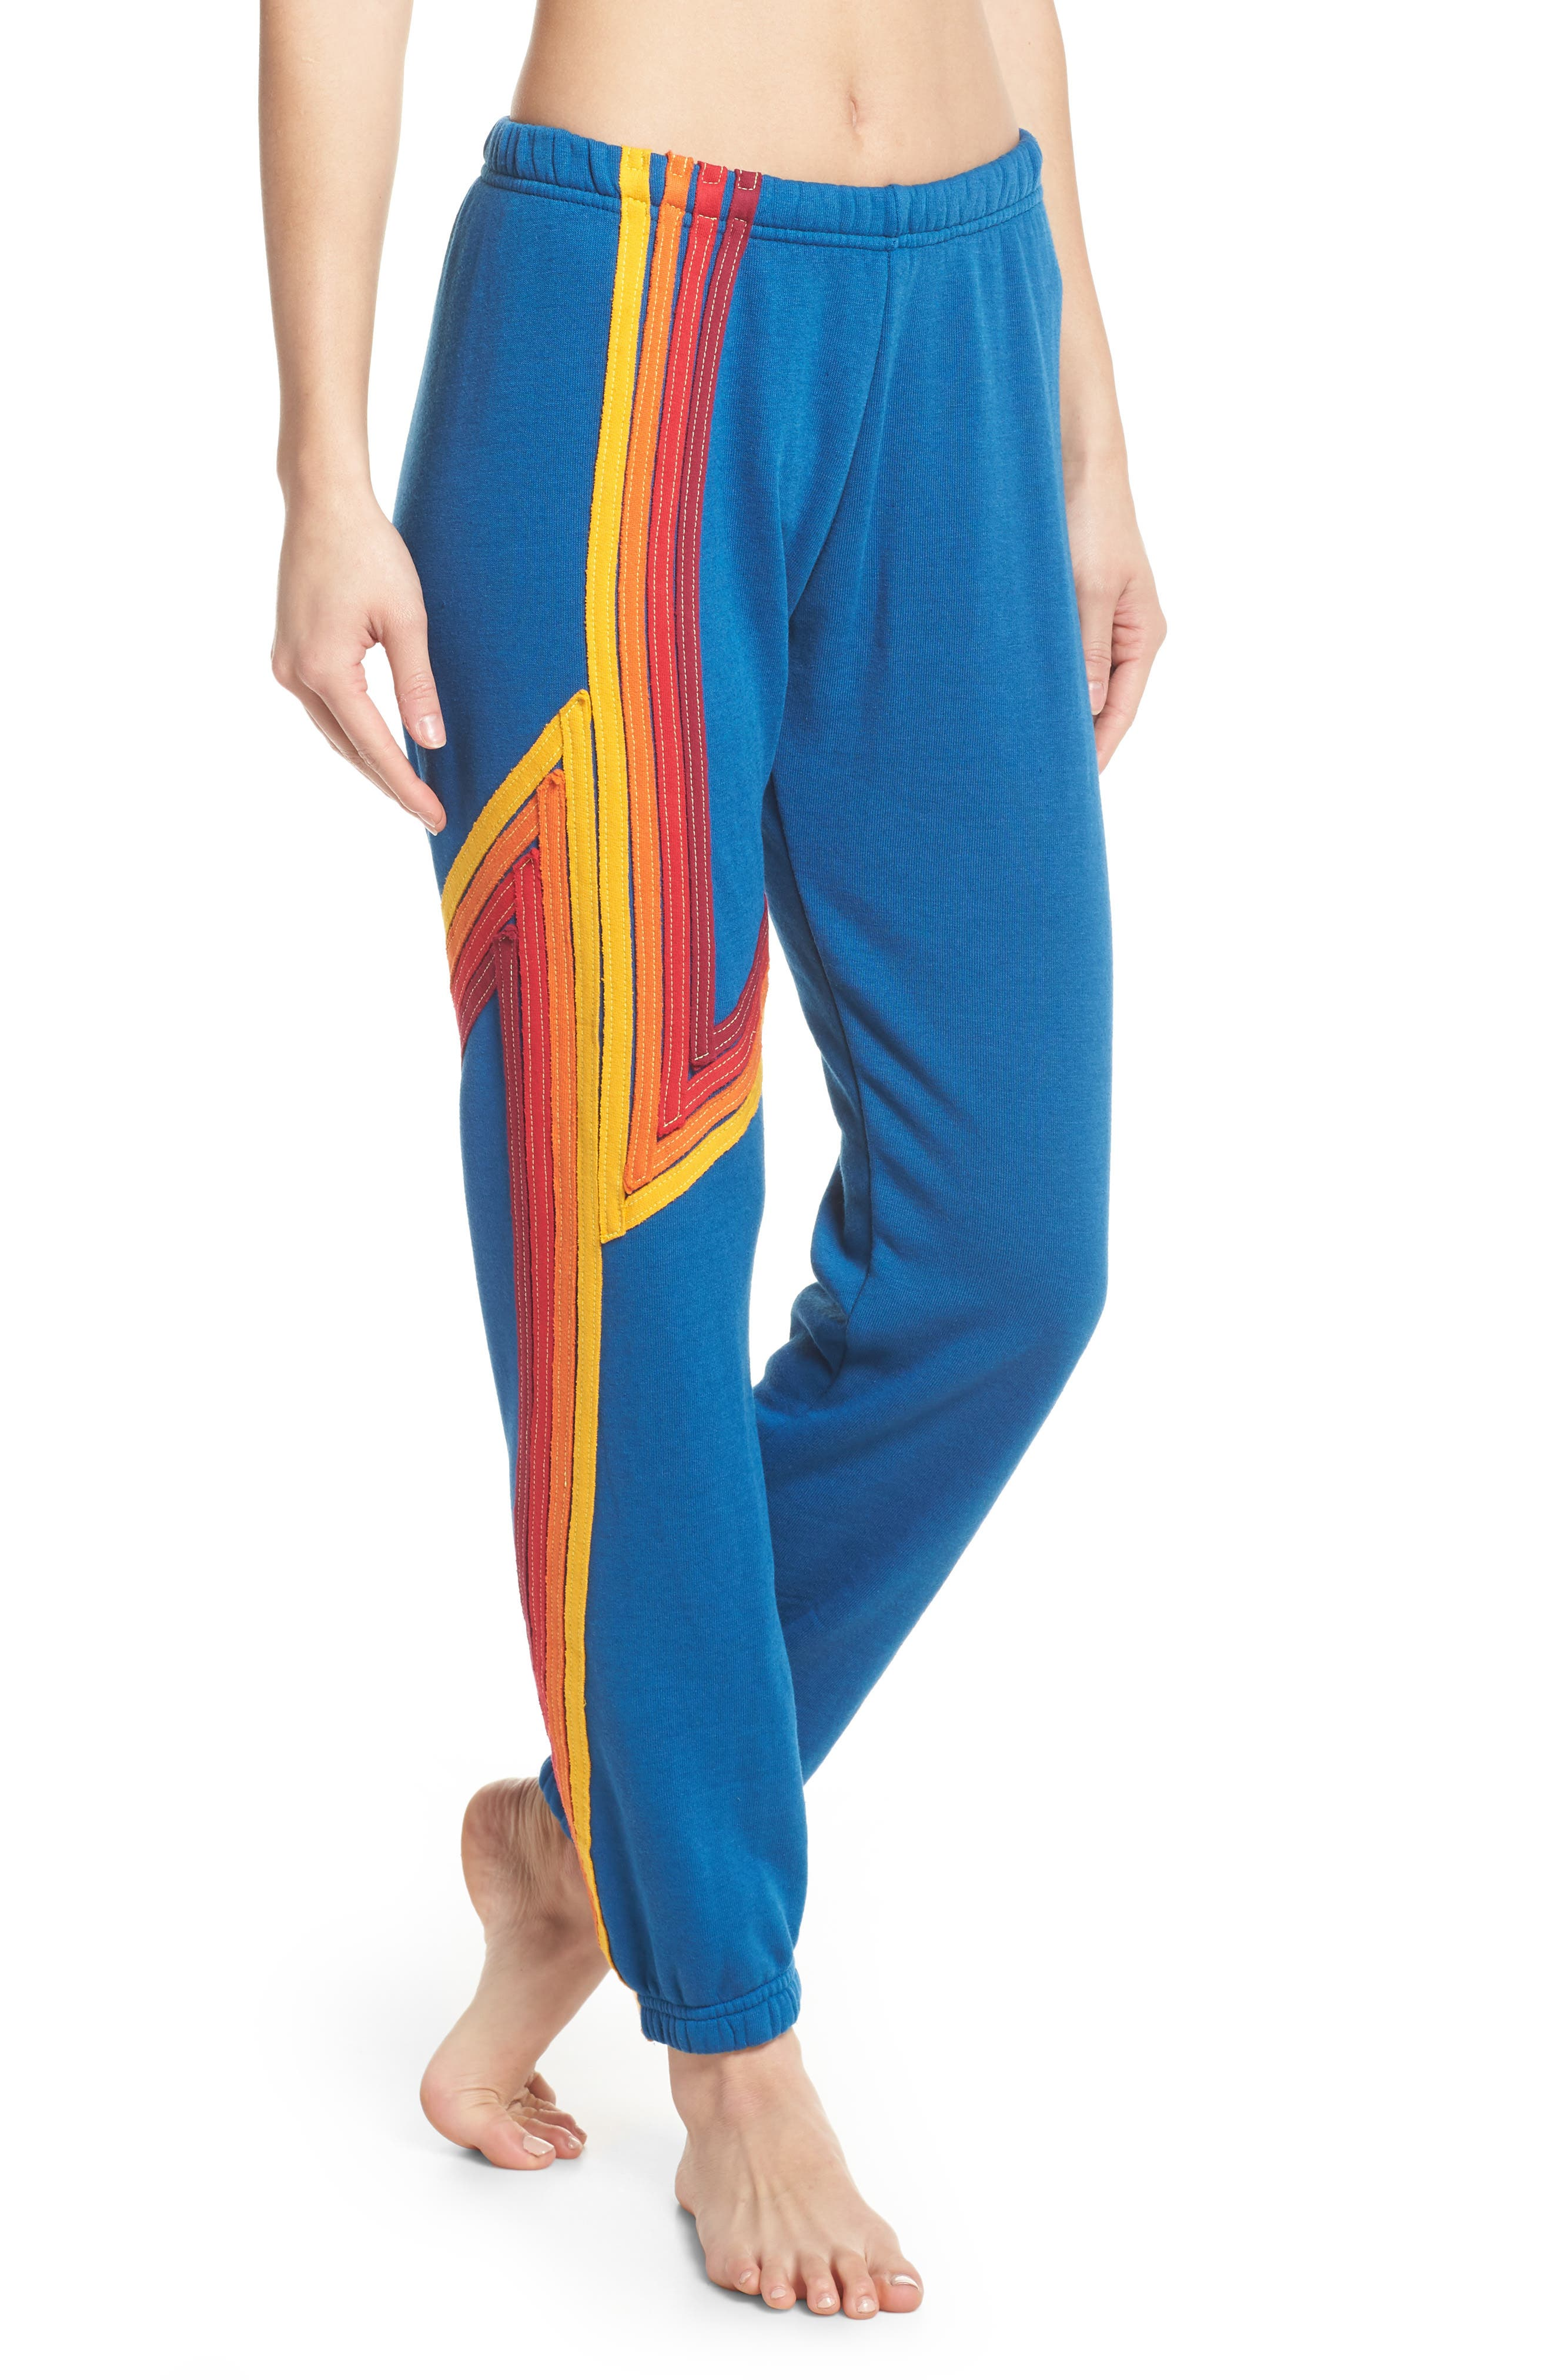 Blaze 4 Sweatpants,                             Main thumbnail 1, color,                             Caribbean/ Red Stripe